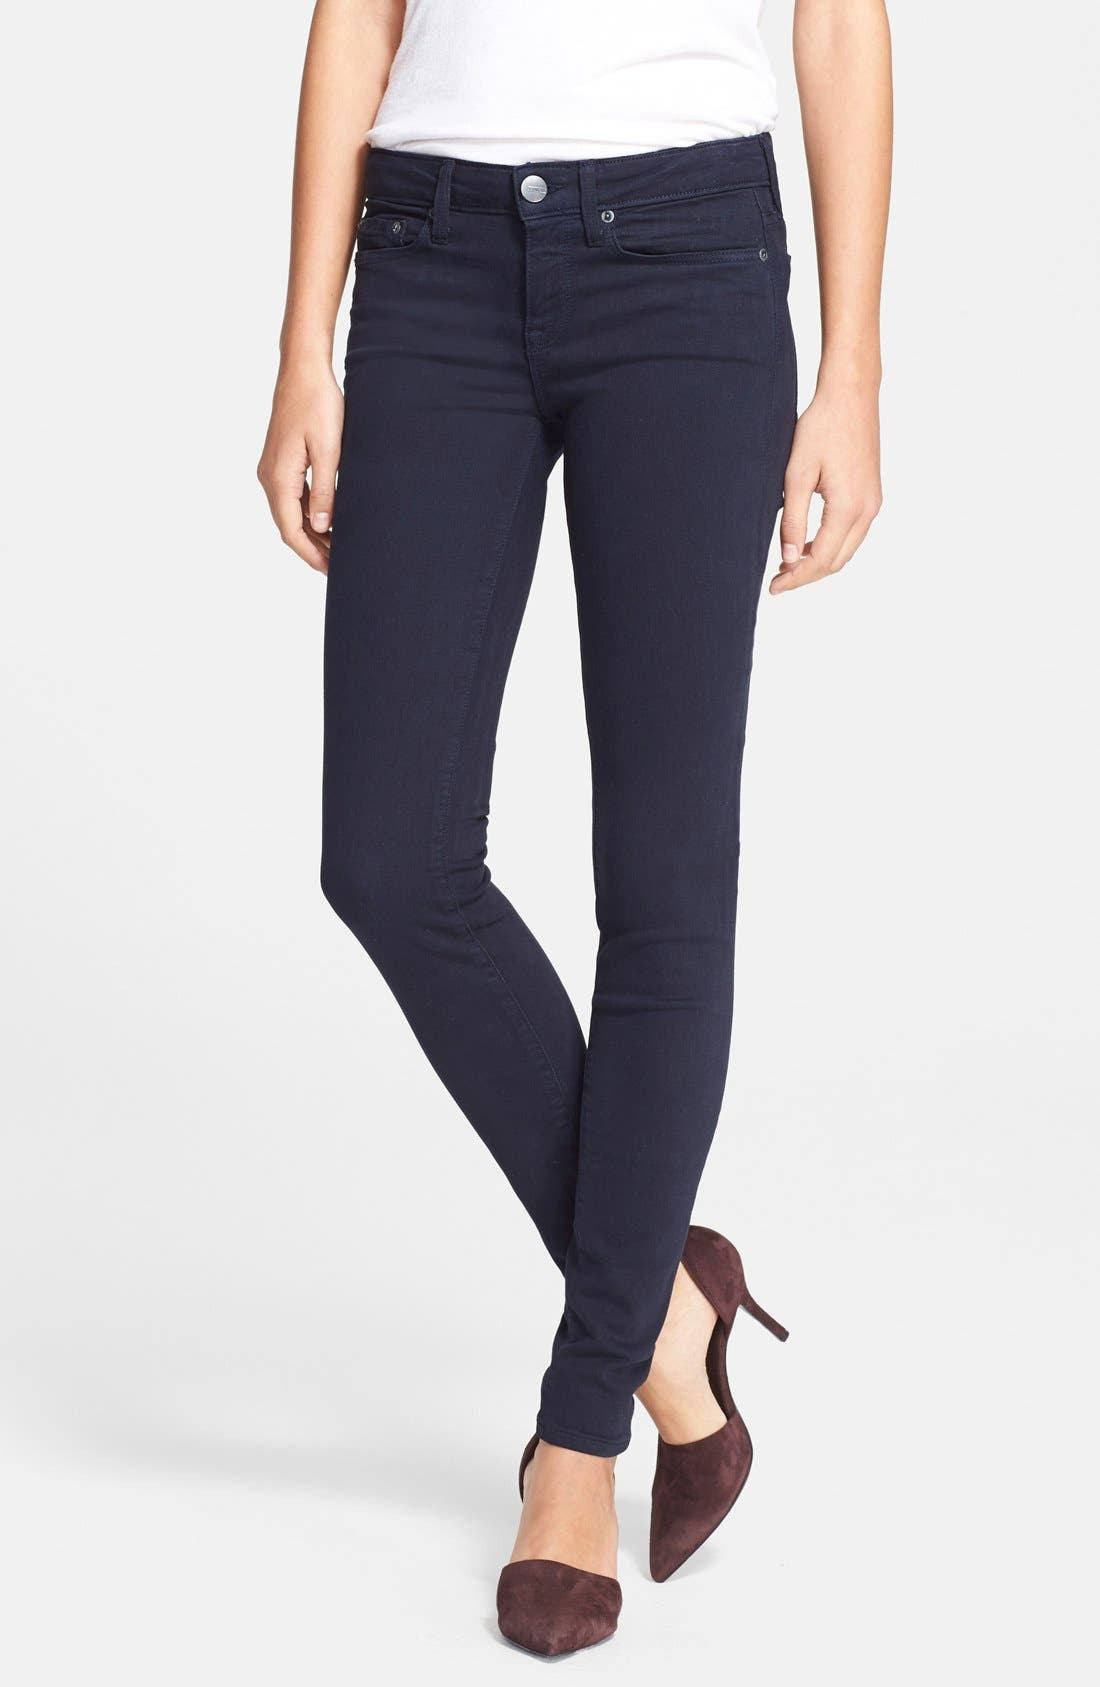 Alternate Image 1 Selected - Vince 'Riley' Skinny Jeans (Coastal Blue)